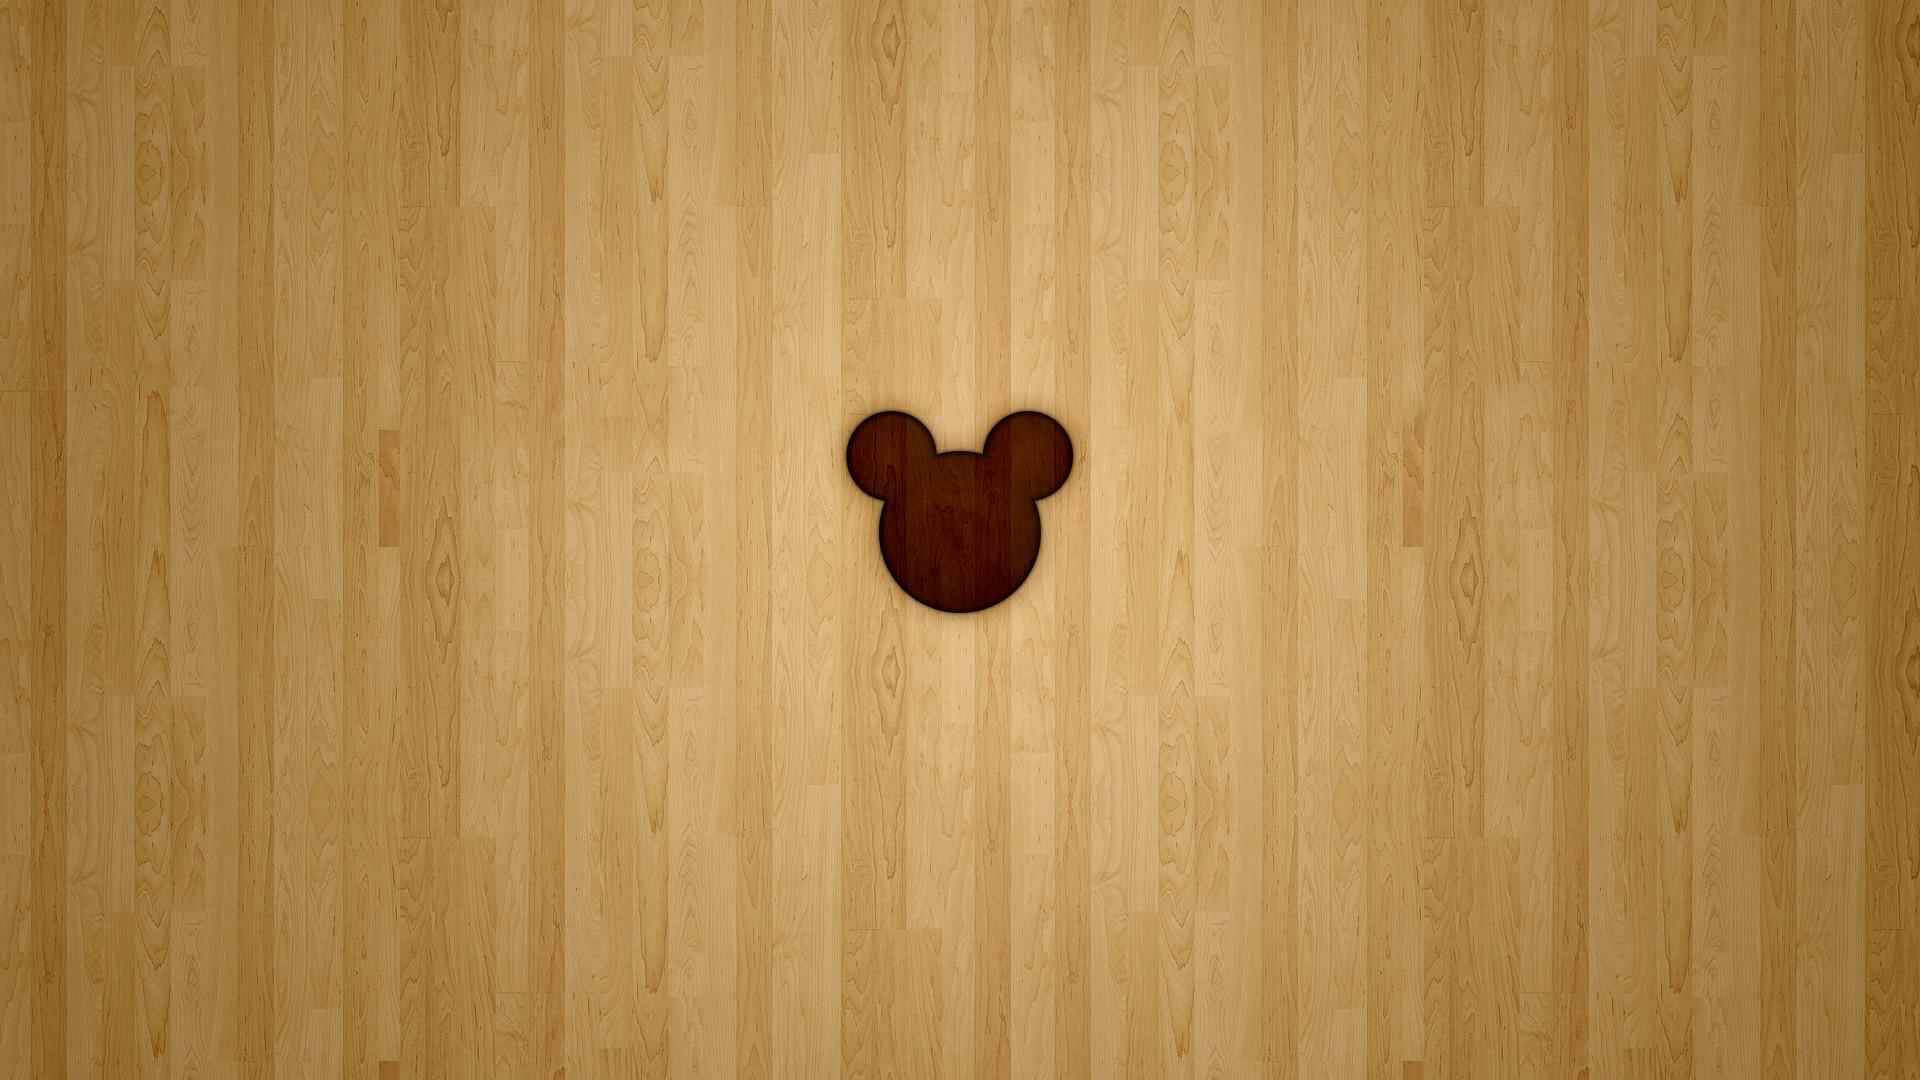 1920x1080 Mickey Mouse Disney HD desktop wallpaper Widescreen High